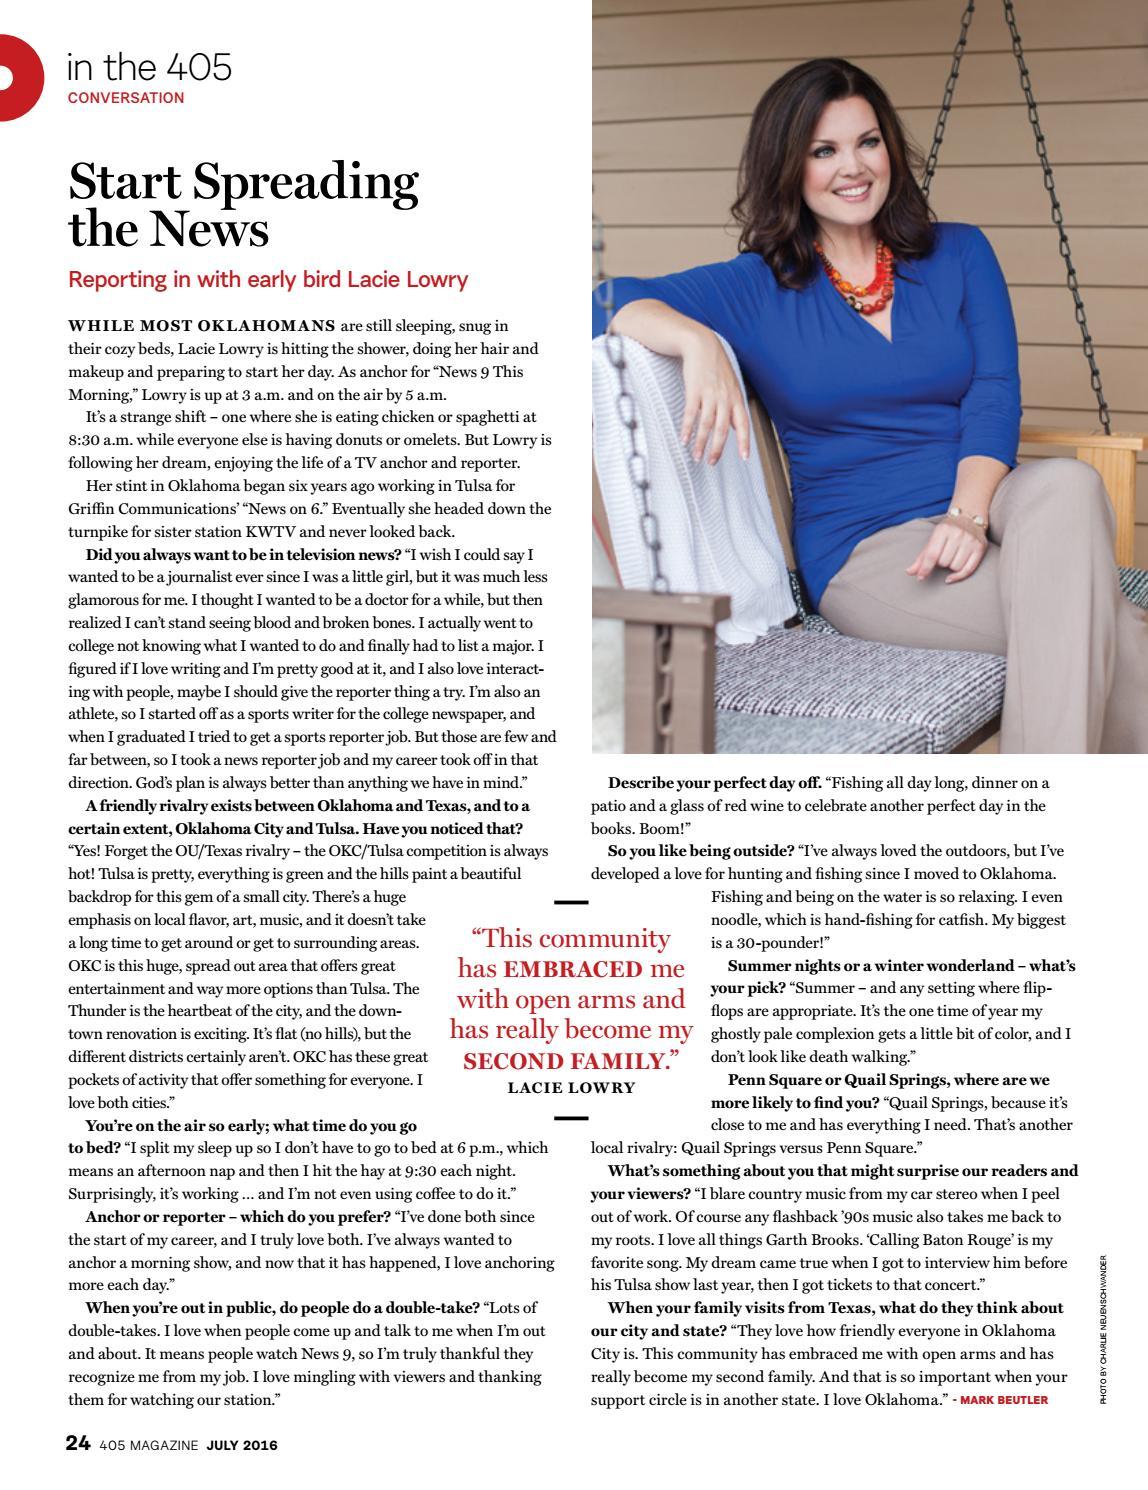 405magazine July 16 by 405 Magazine - issuu